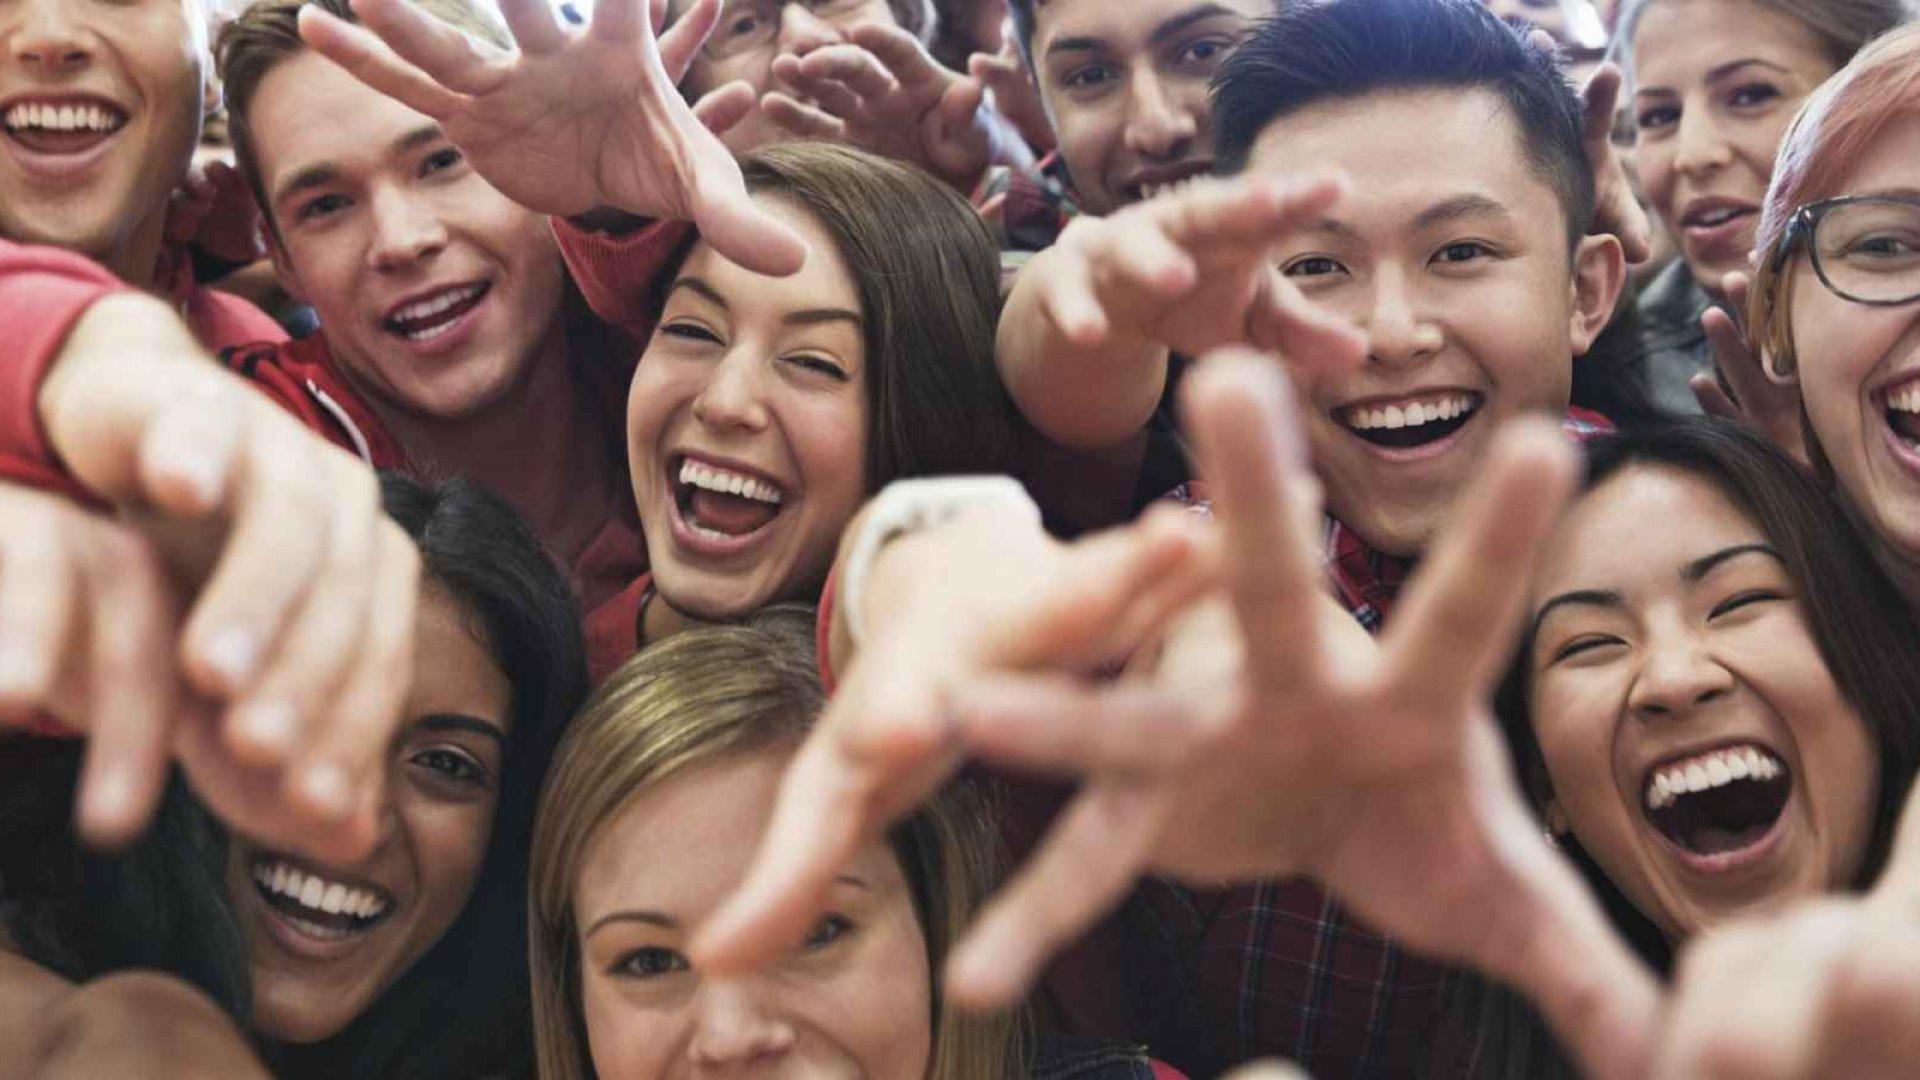 Emotional Intelligence, Generation Z, and the Next Big Leadership Challenge